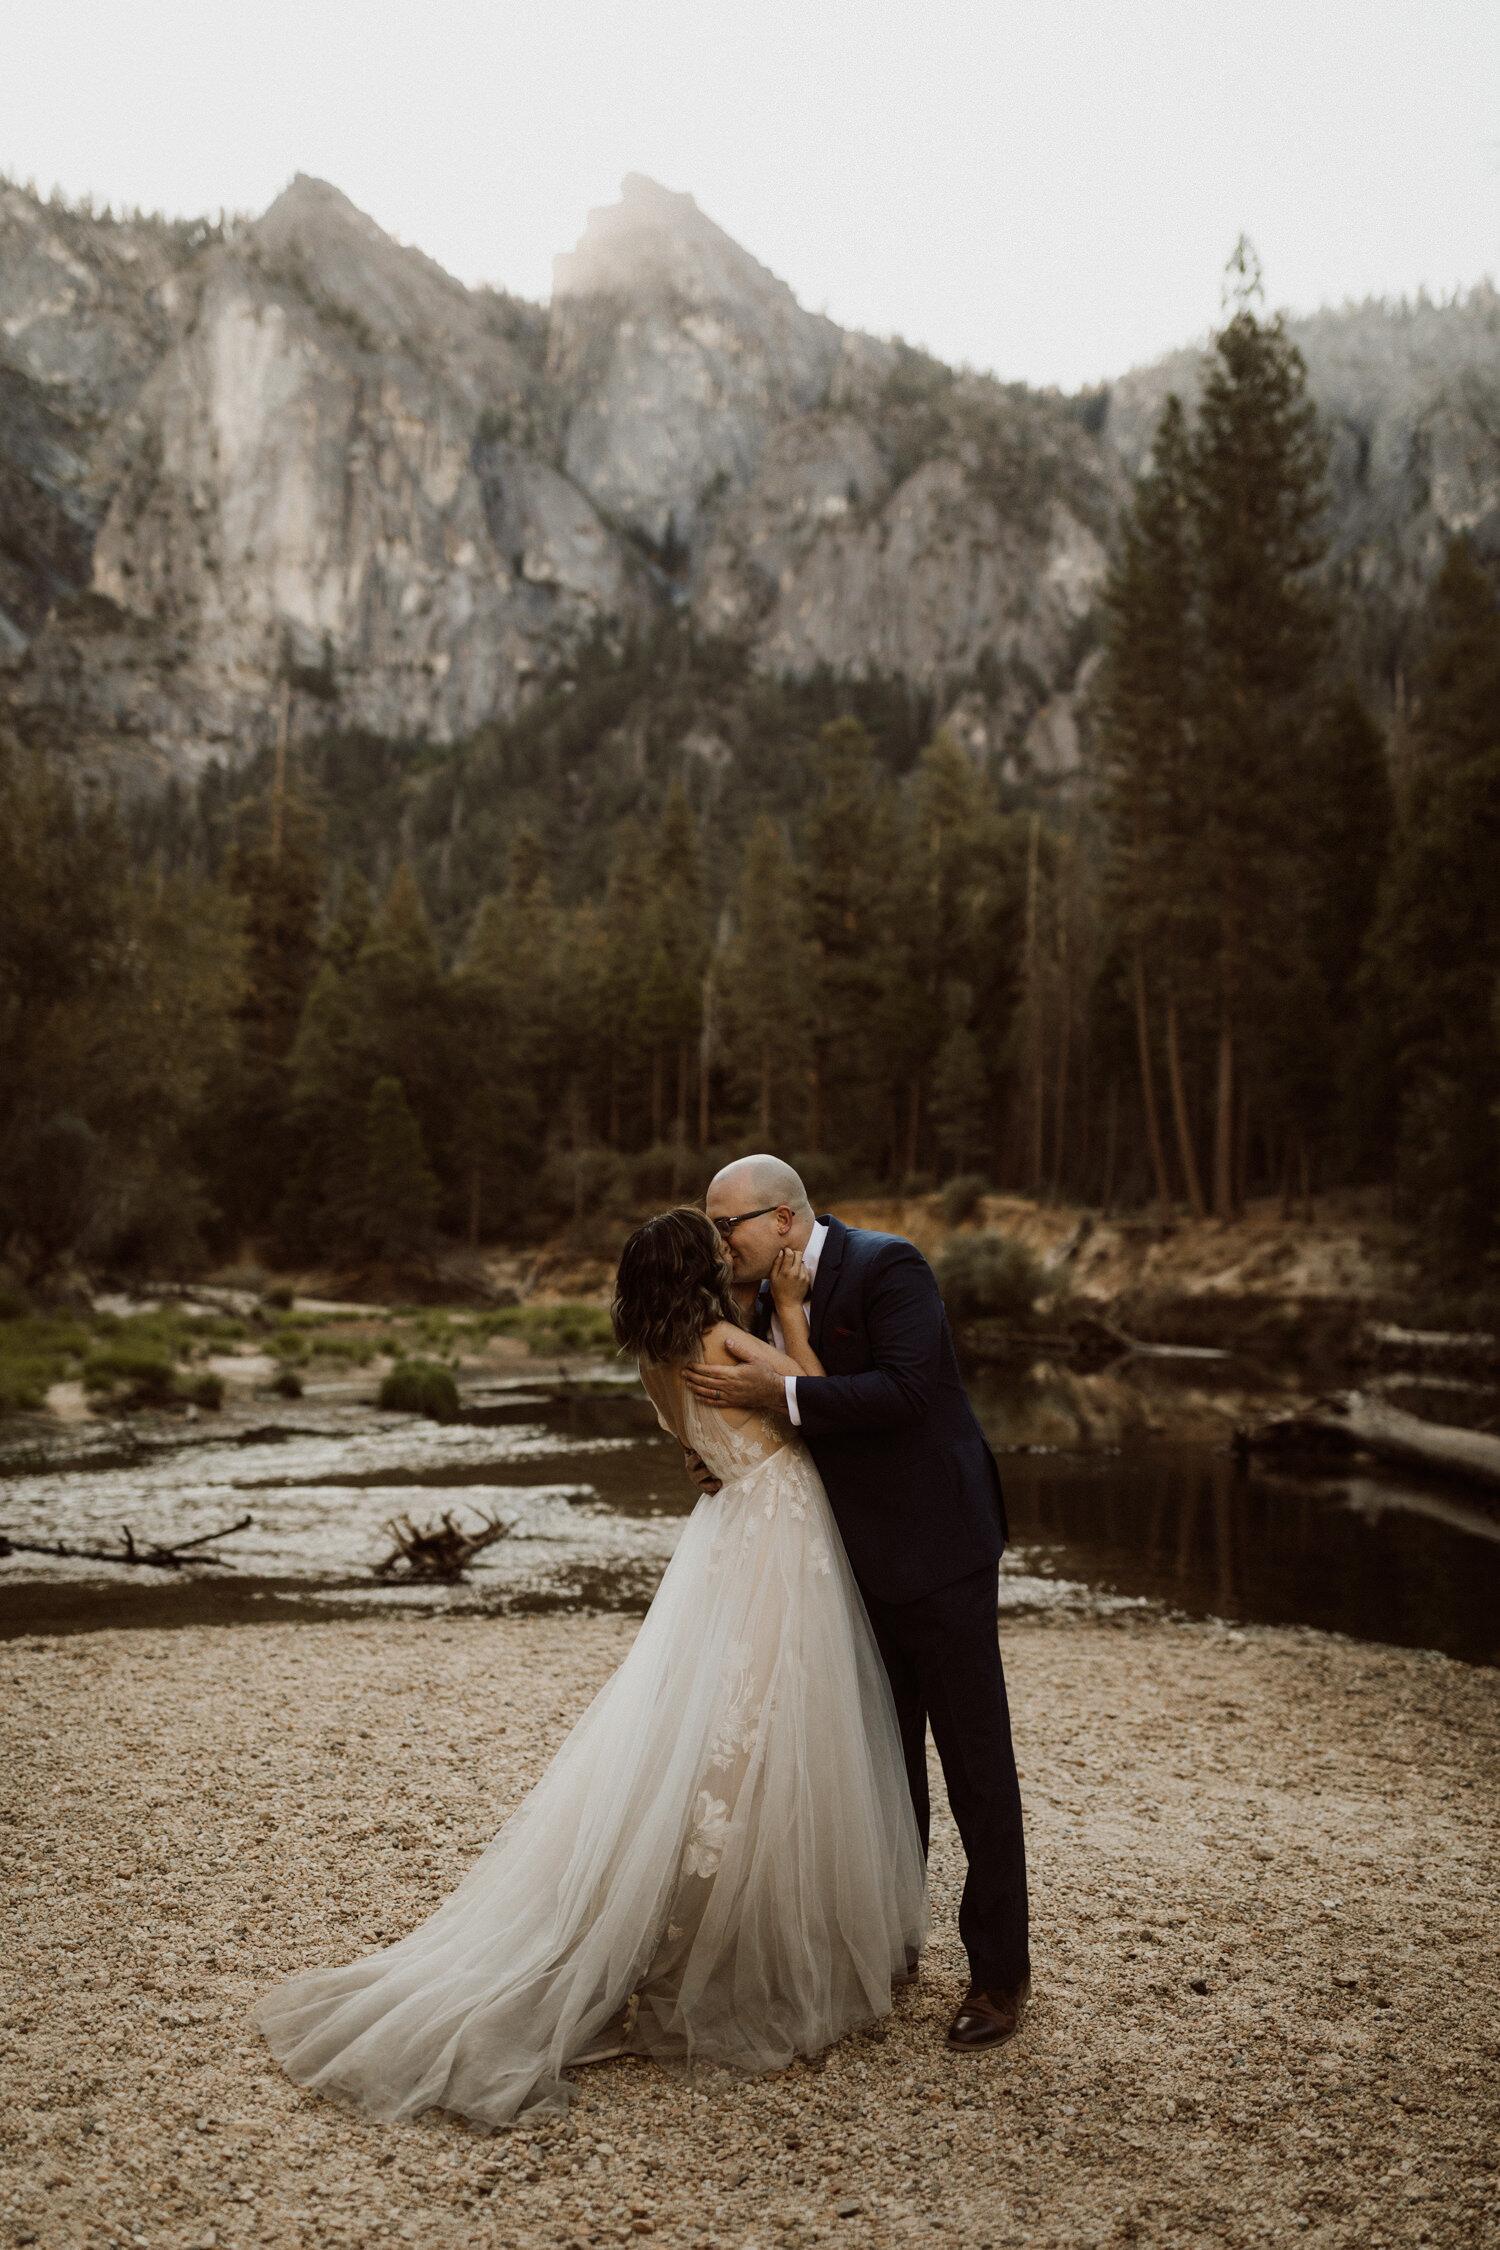 adventure-wedding-yosemite-national-park-19.jpg